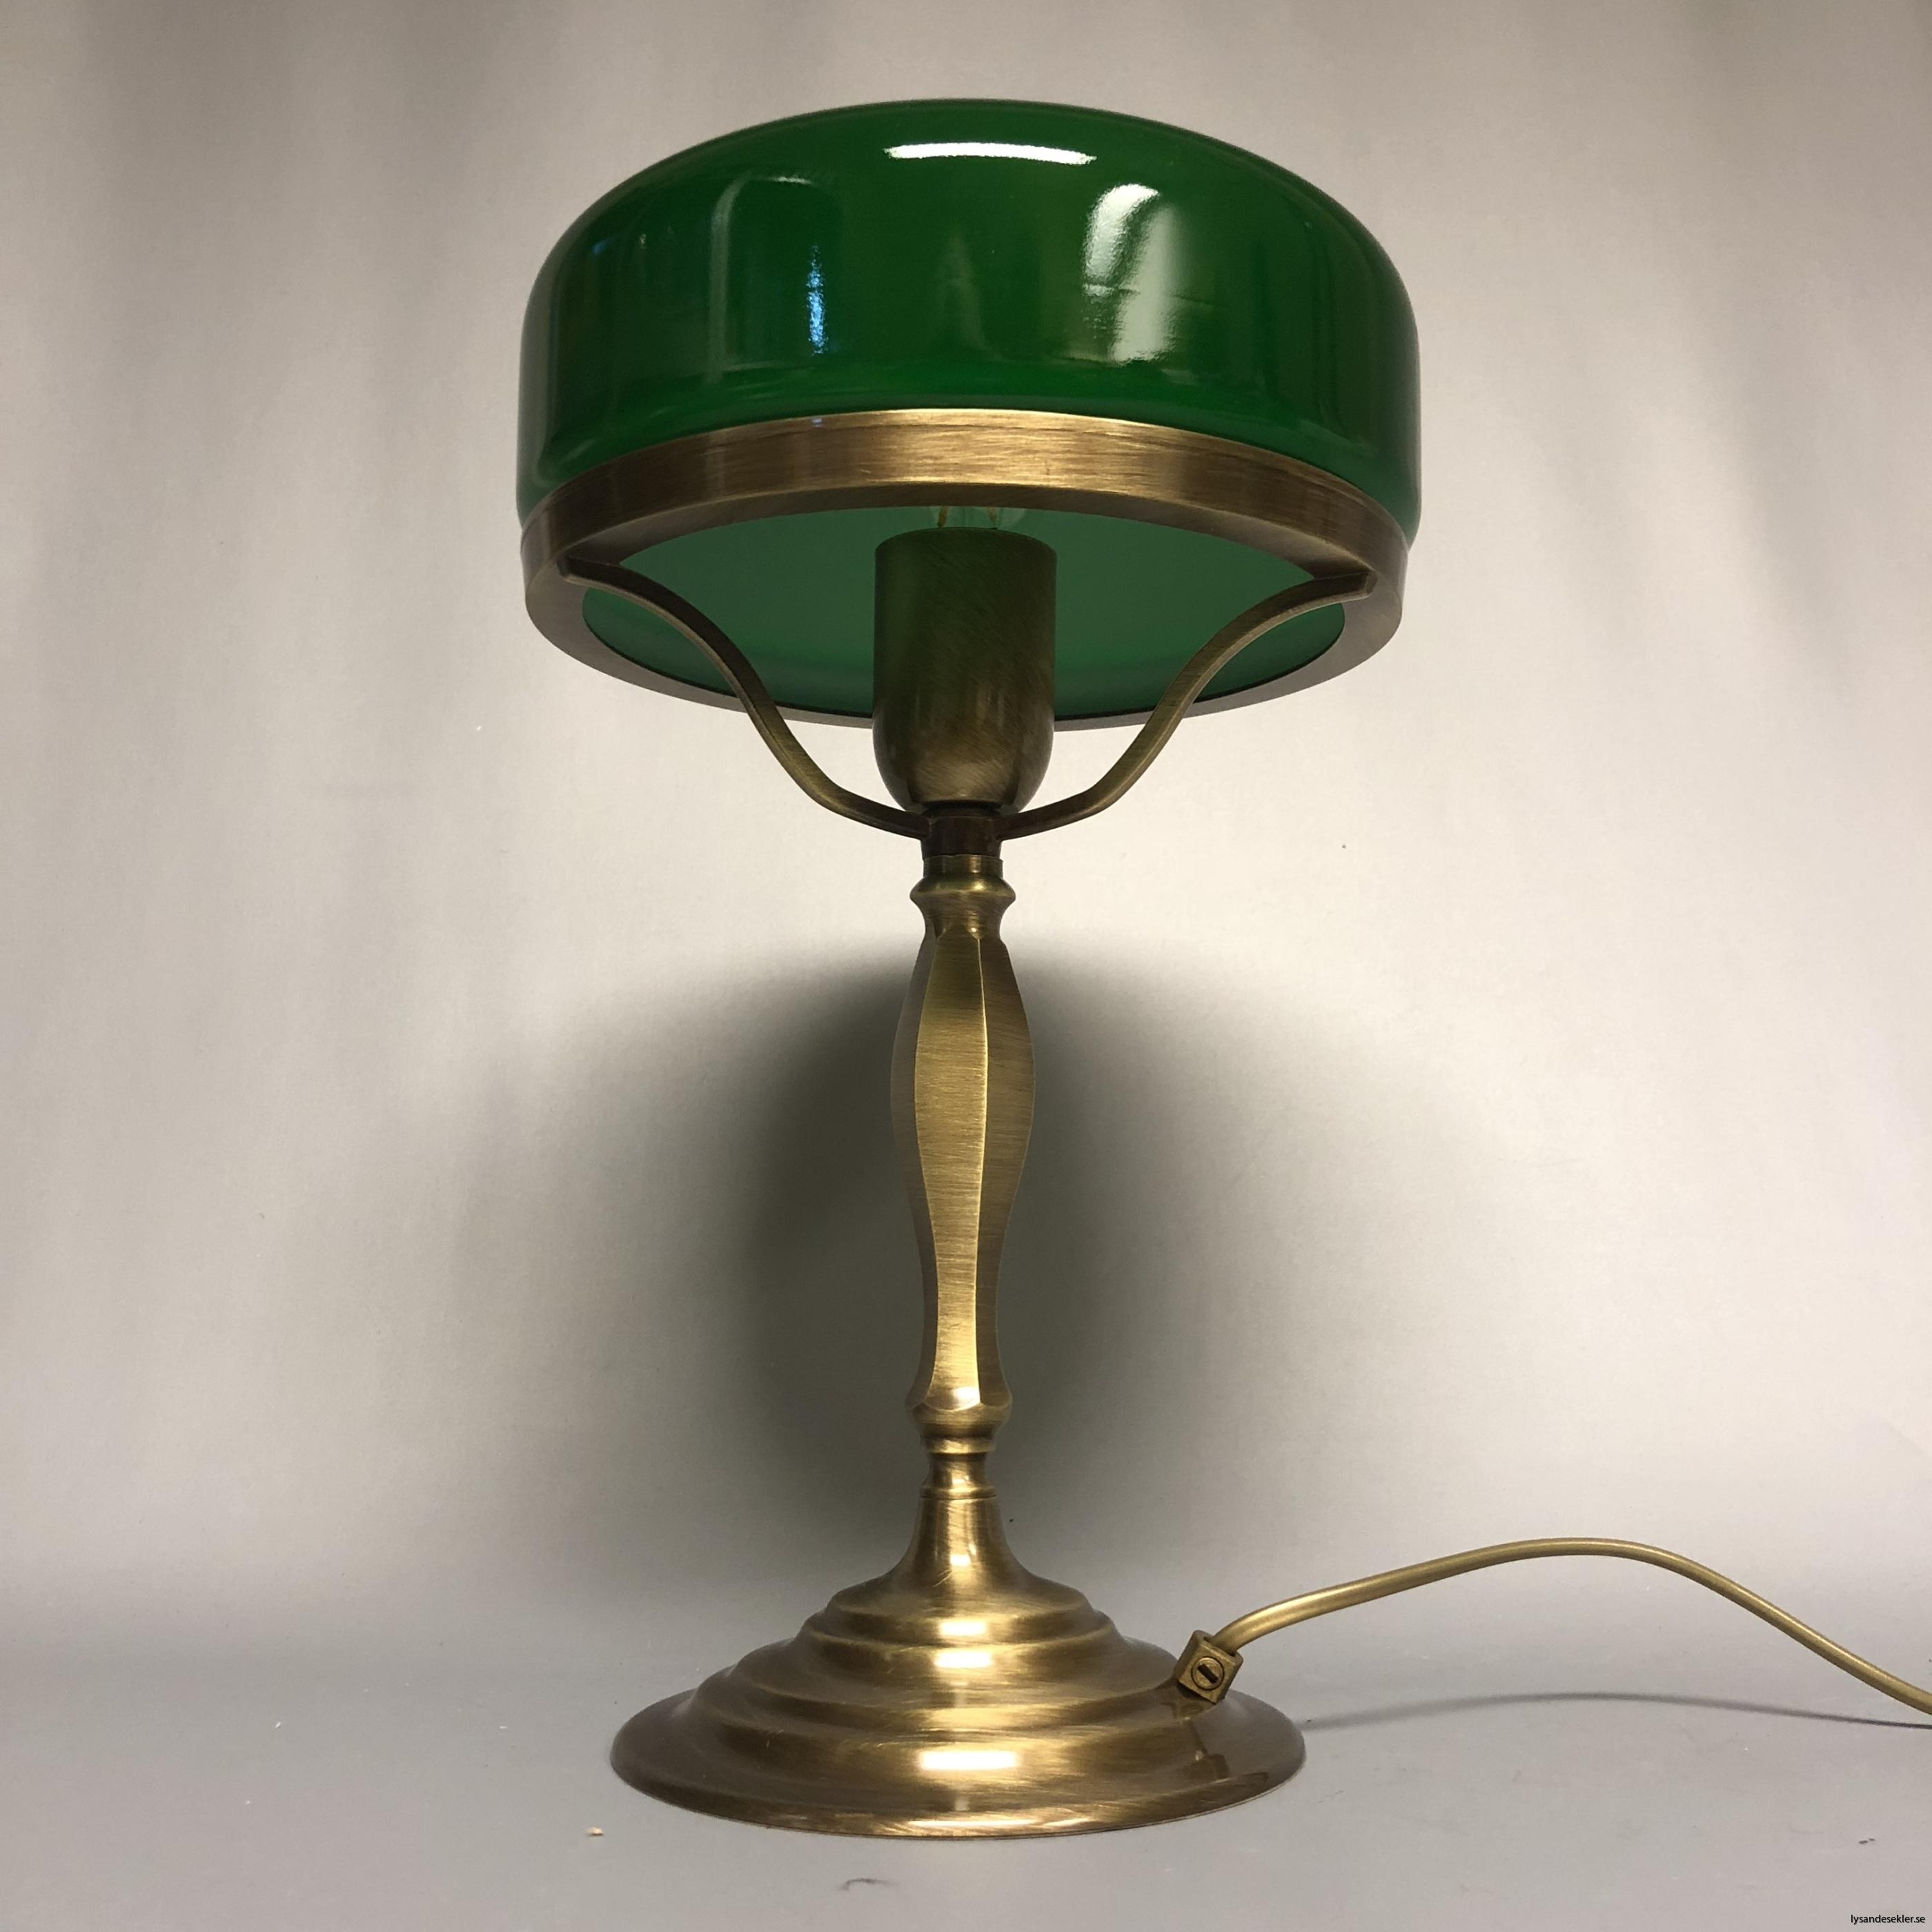 strindbergslampa strindbergslampor strindberg lampa skärm kupa strindbergsskärm strindbergskupa39